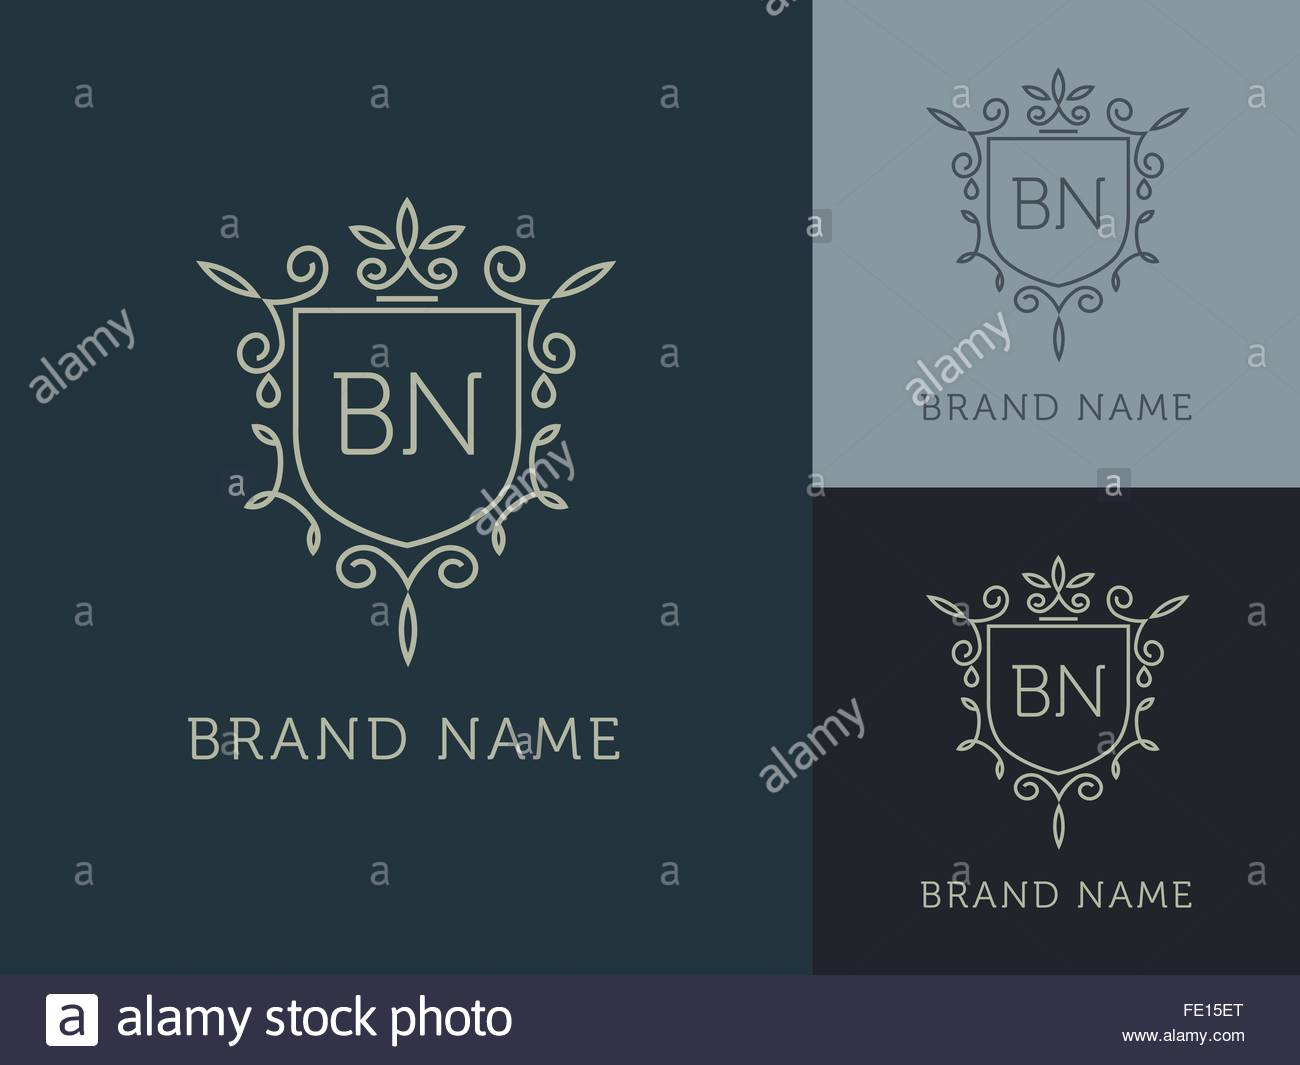 04 General logo - elegant monogram, blue - Stock Image